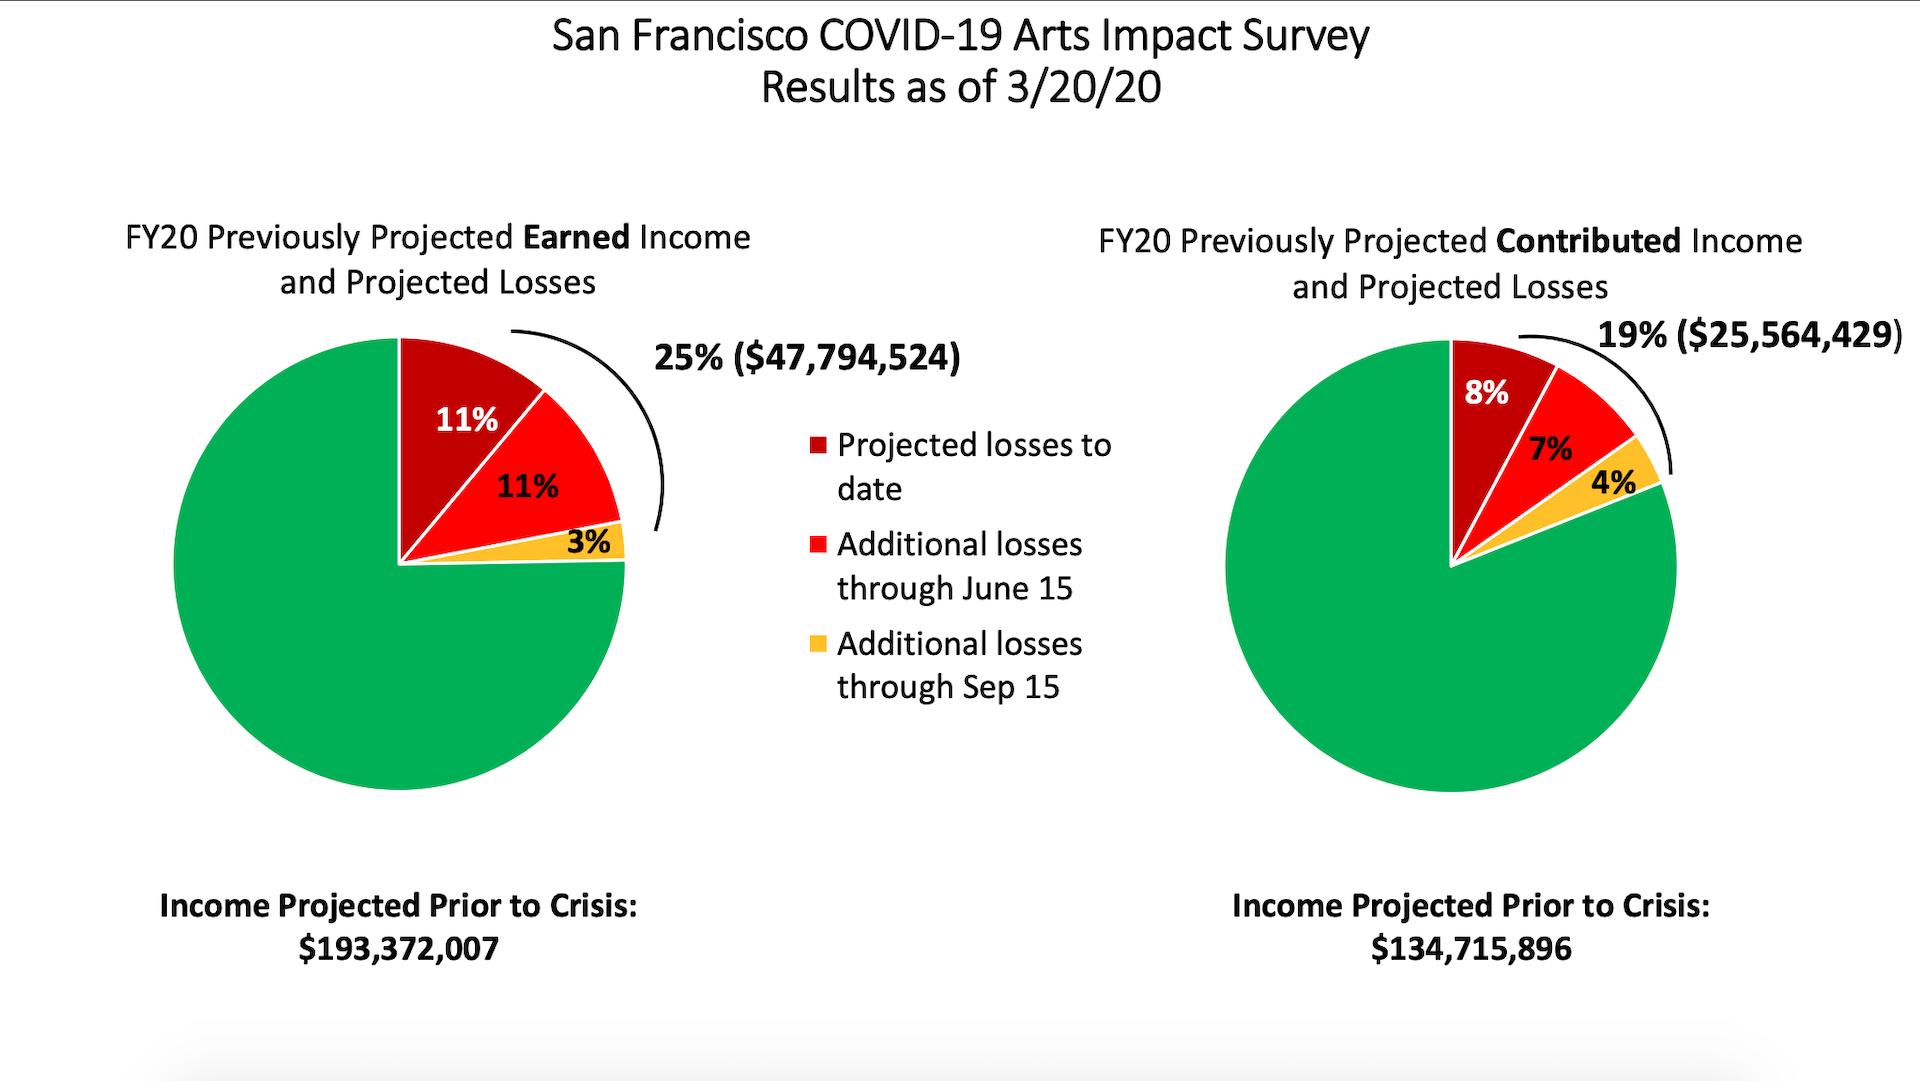 The San Francisco Arts Alliance surveyed arts organizations about the novel coronavirus' impact on revenue.